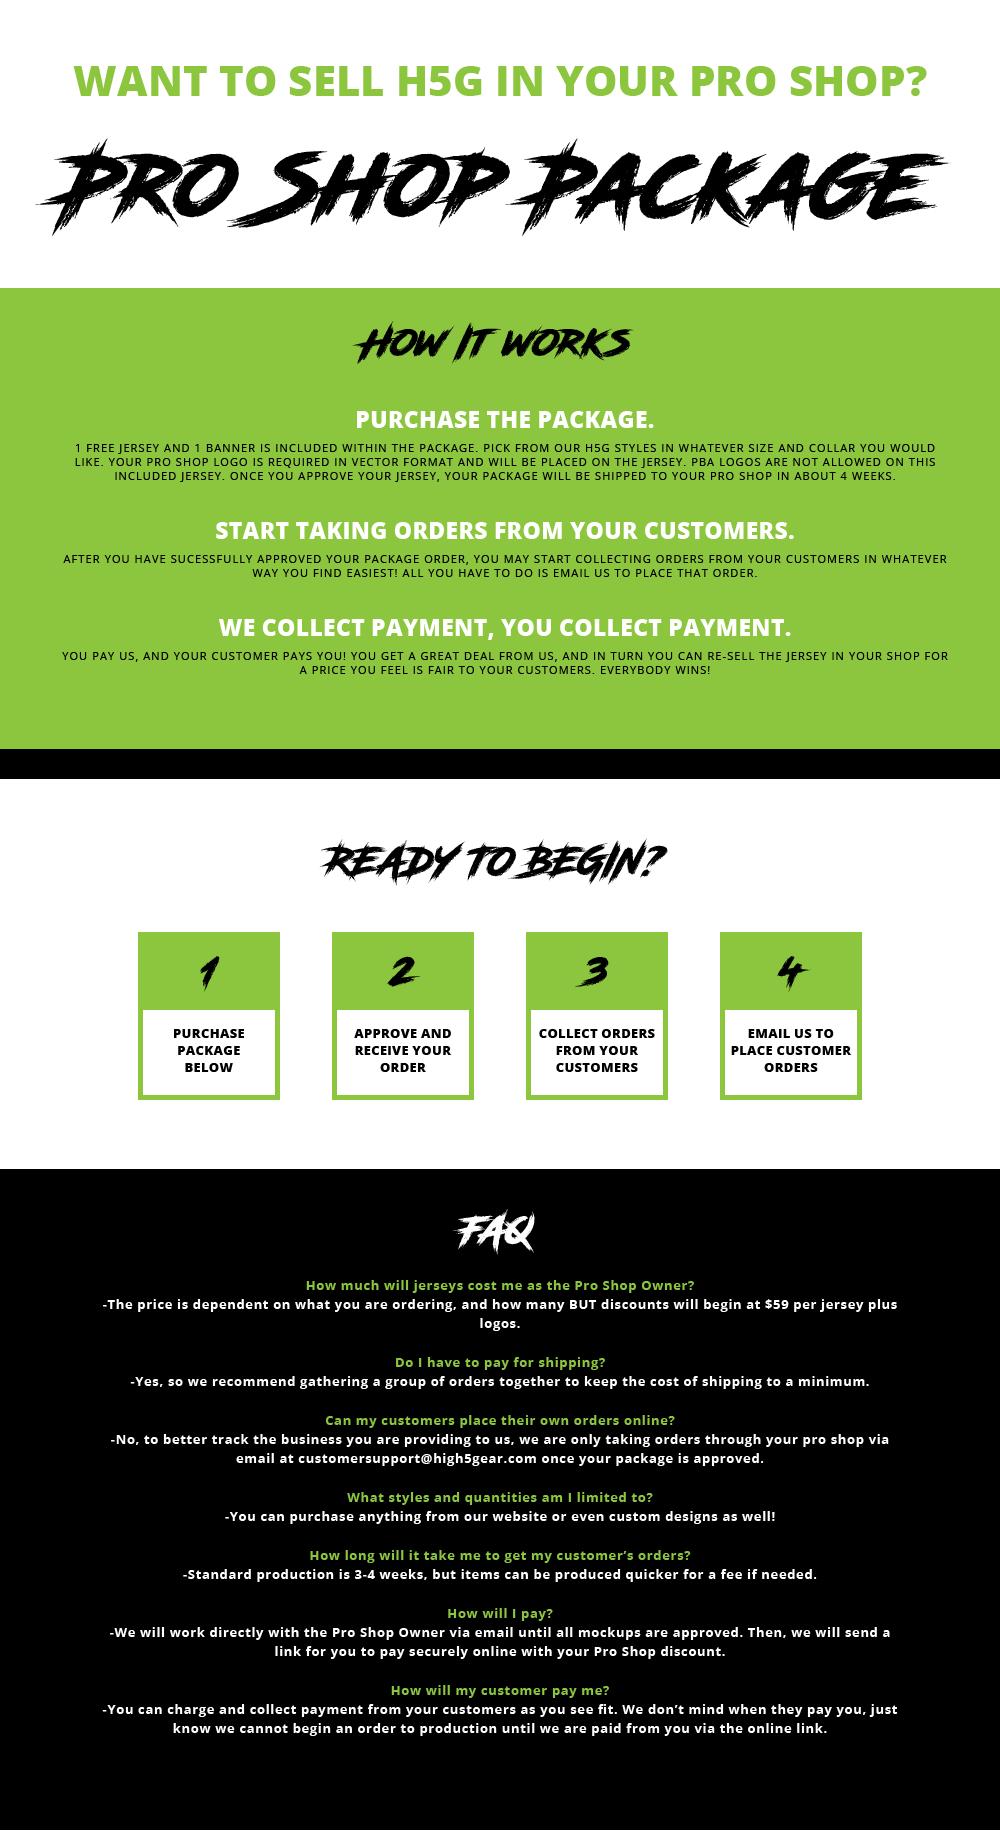 Pro Shop Package - Schools & Programs - BOWLING